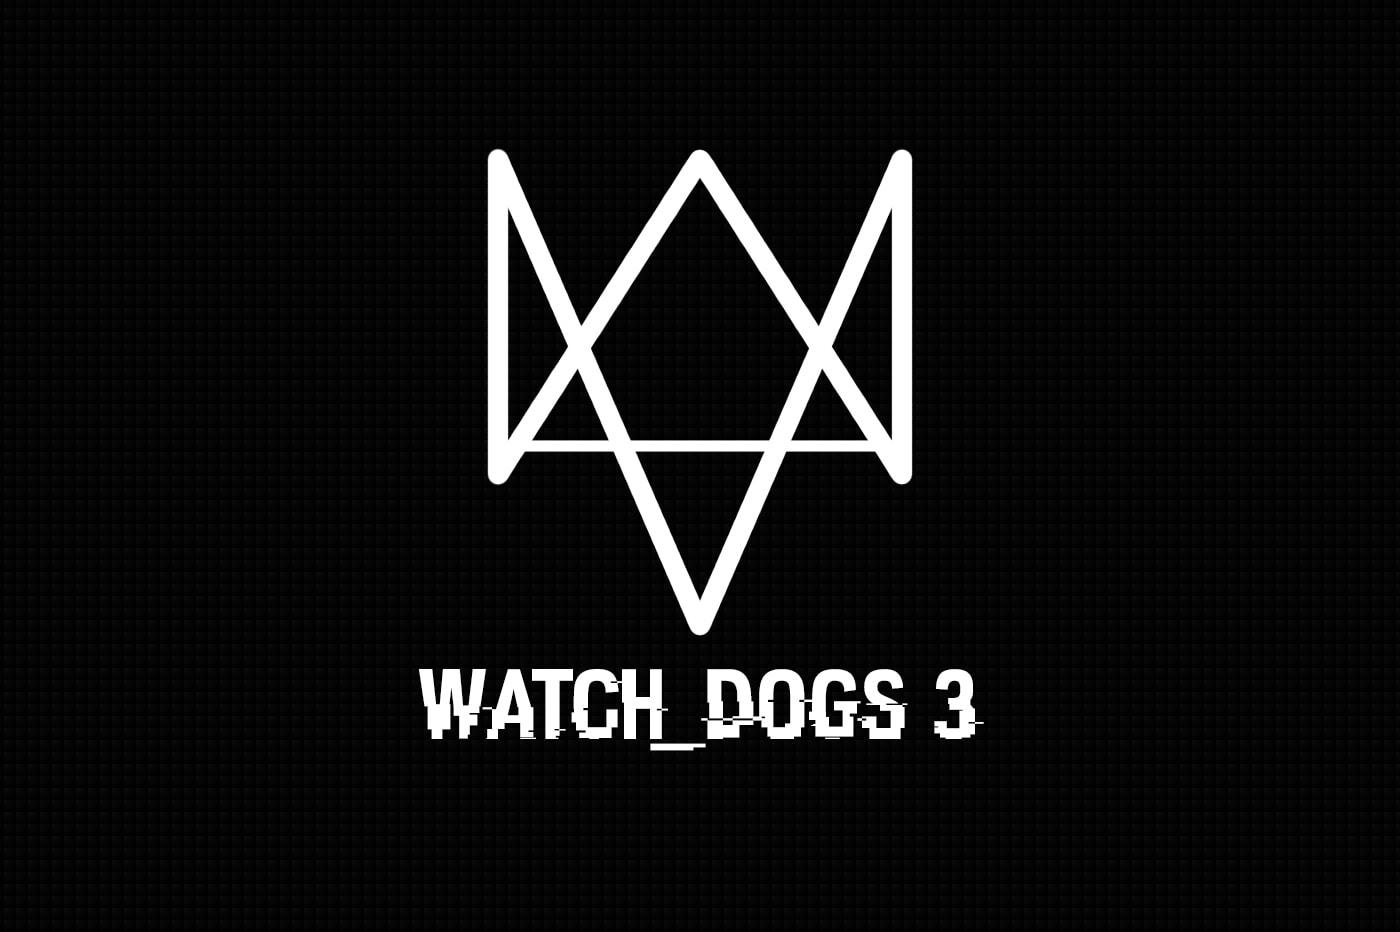 Photo of إشاعة : شركة يوبي سوفت تنوي الكشف عن لعبة Watch Dogs 3 بتاريخ 24 مايو القادم .